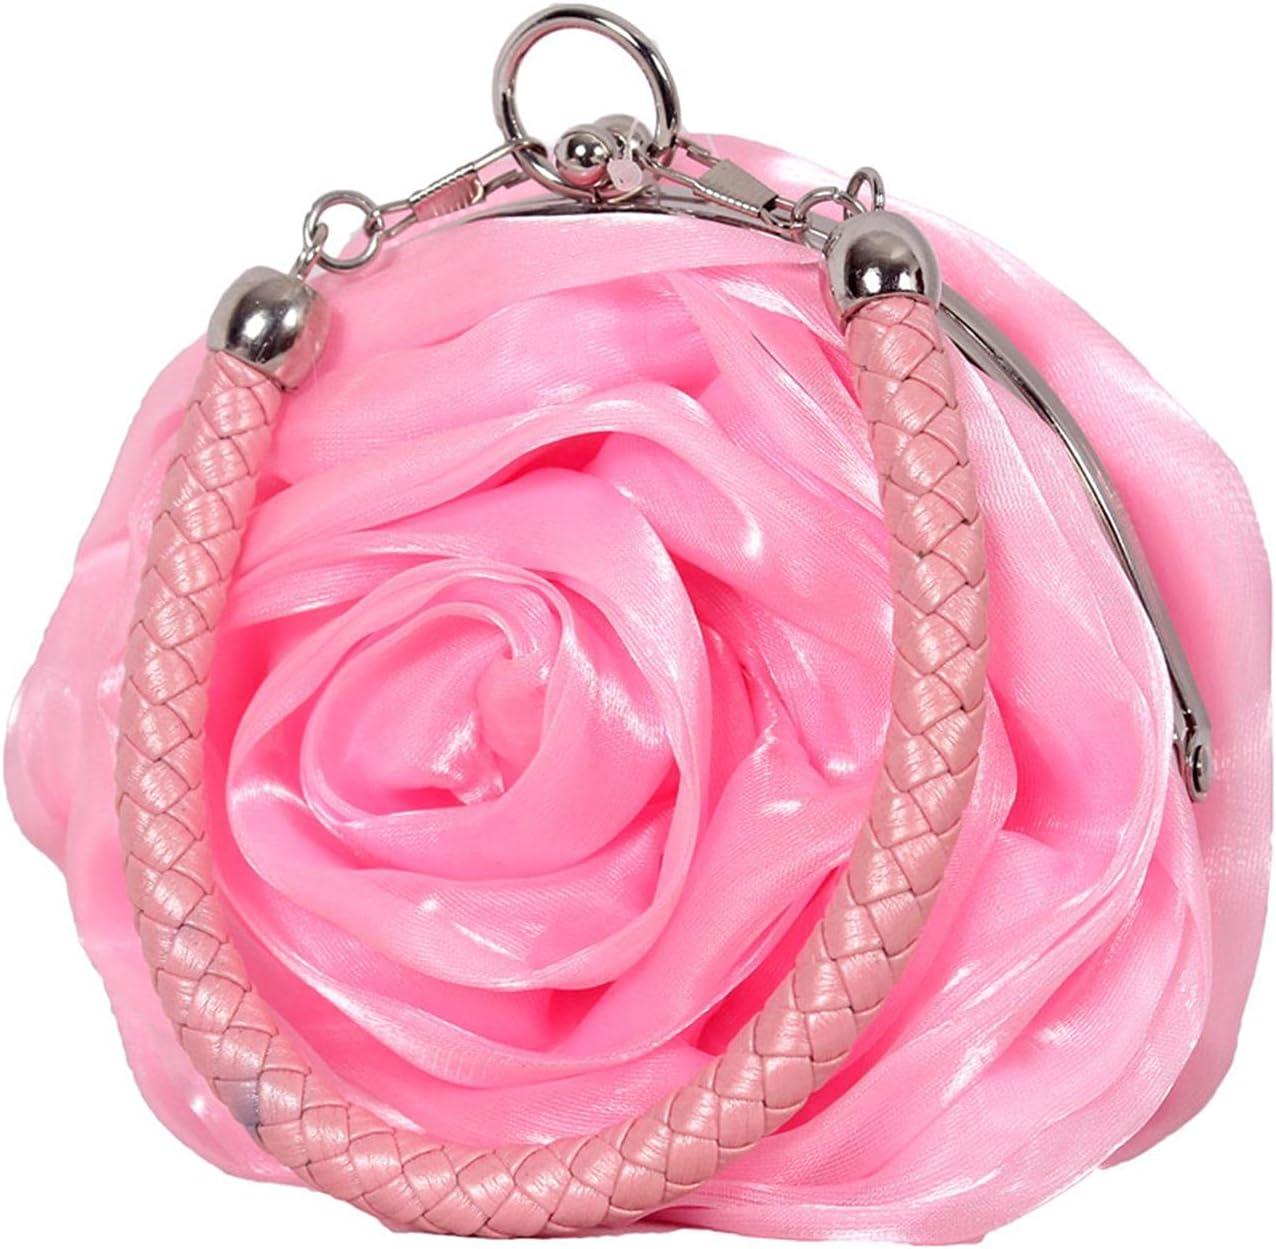 Lovely Mini Round Silk Rose Flower Handbag, Bridal Wedding Dinner Bag Coin Purse,Pink